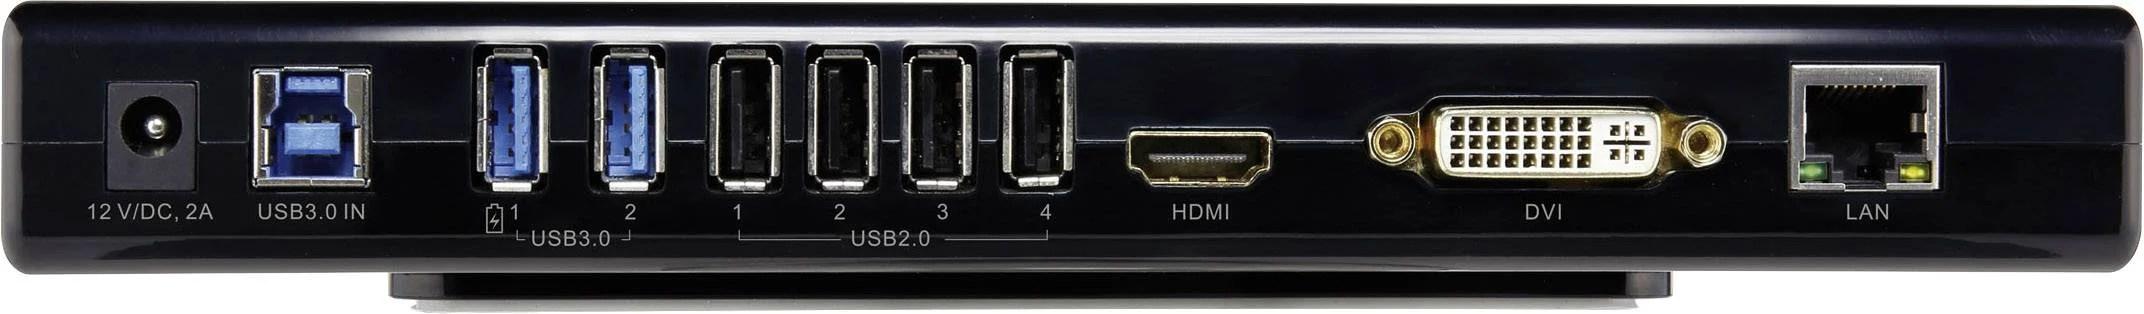 hight resolution of renkforcelaptop docking stationuniversal 2x usb 3 0 4x usb 2 0 1x hdmi headphones